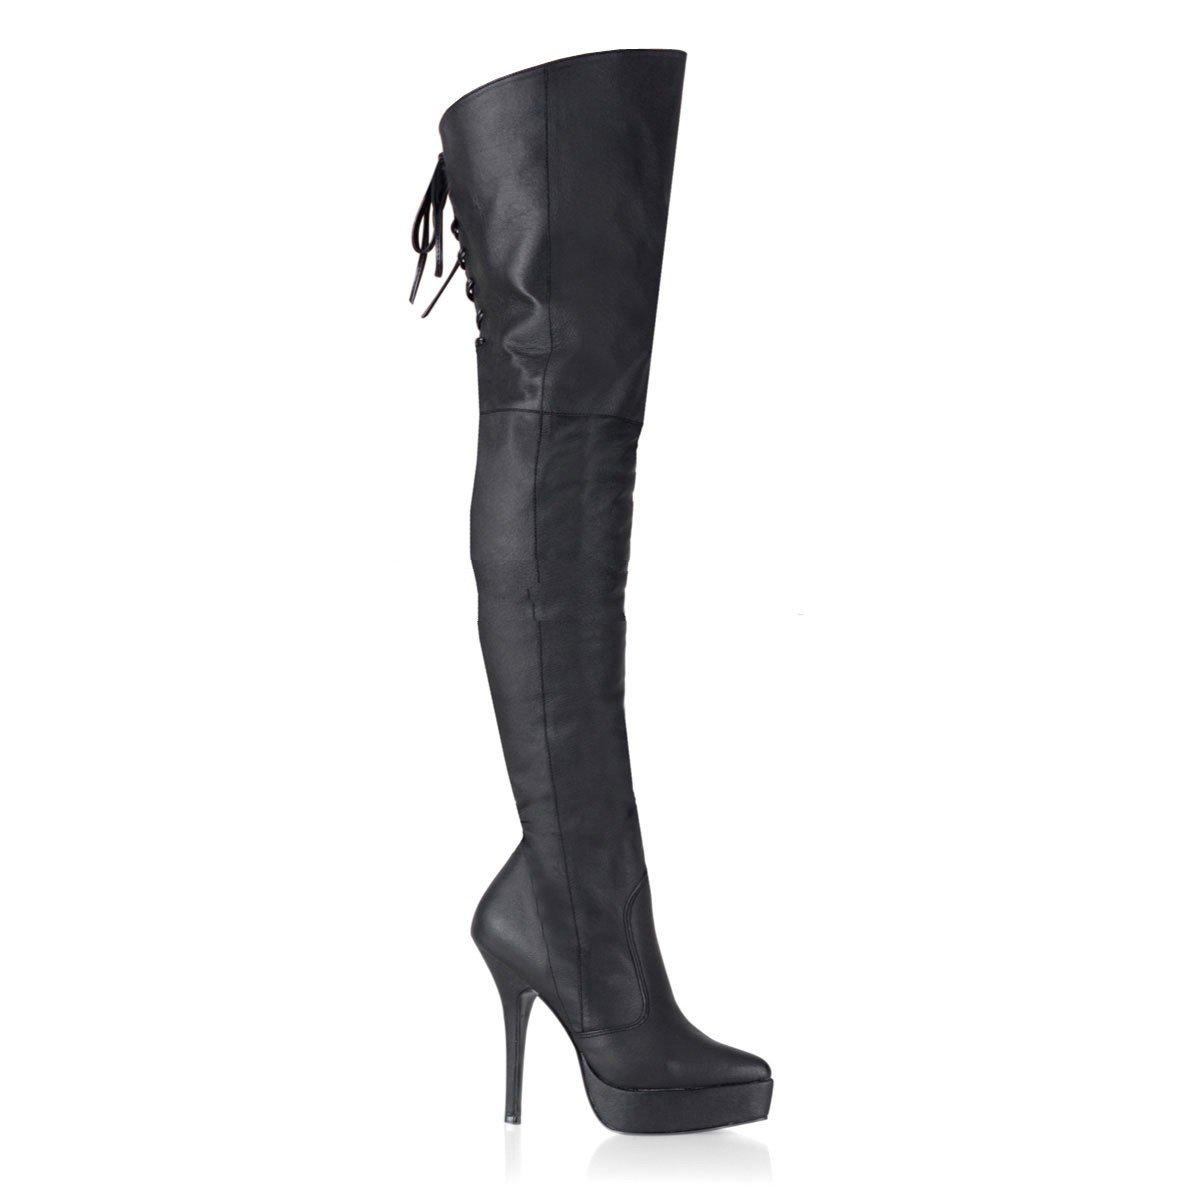 Devious Indulge-3011 - Sexy Fetisch Plateau High Heels Overknee Stiefel 36-48, Größe EU-39   US-9   UK-6